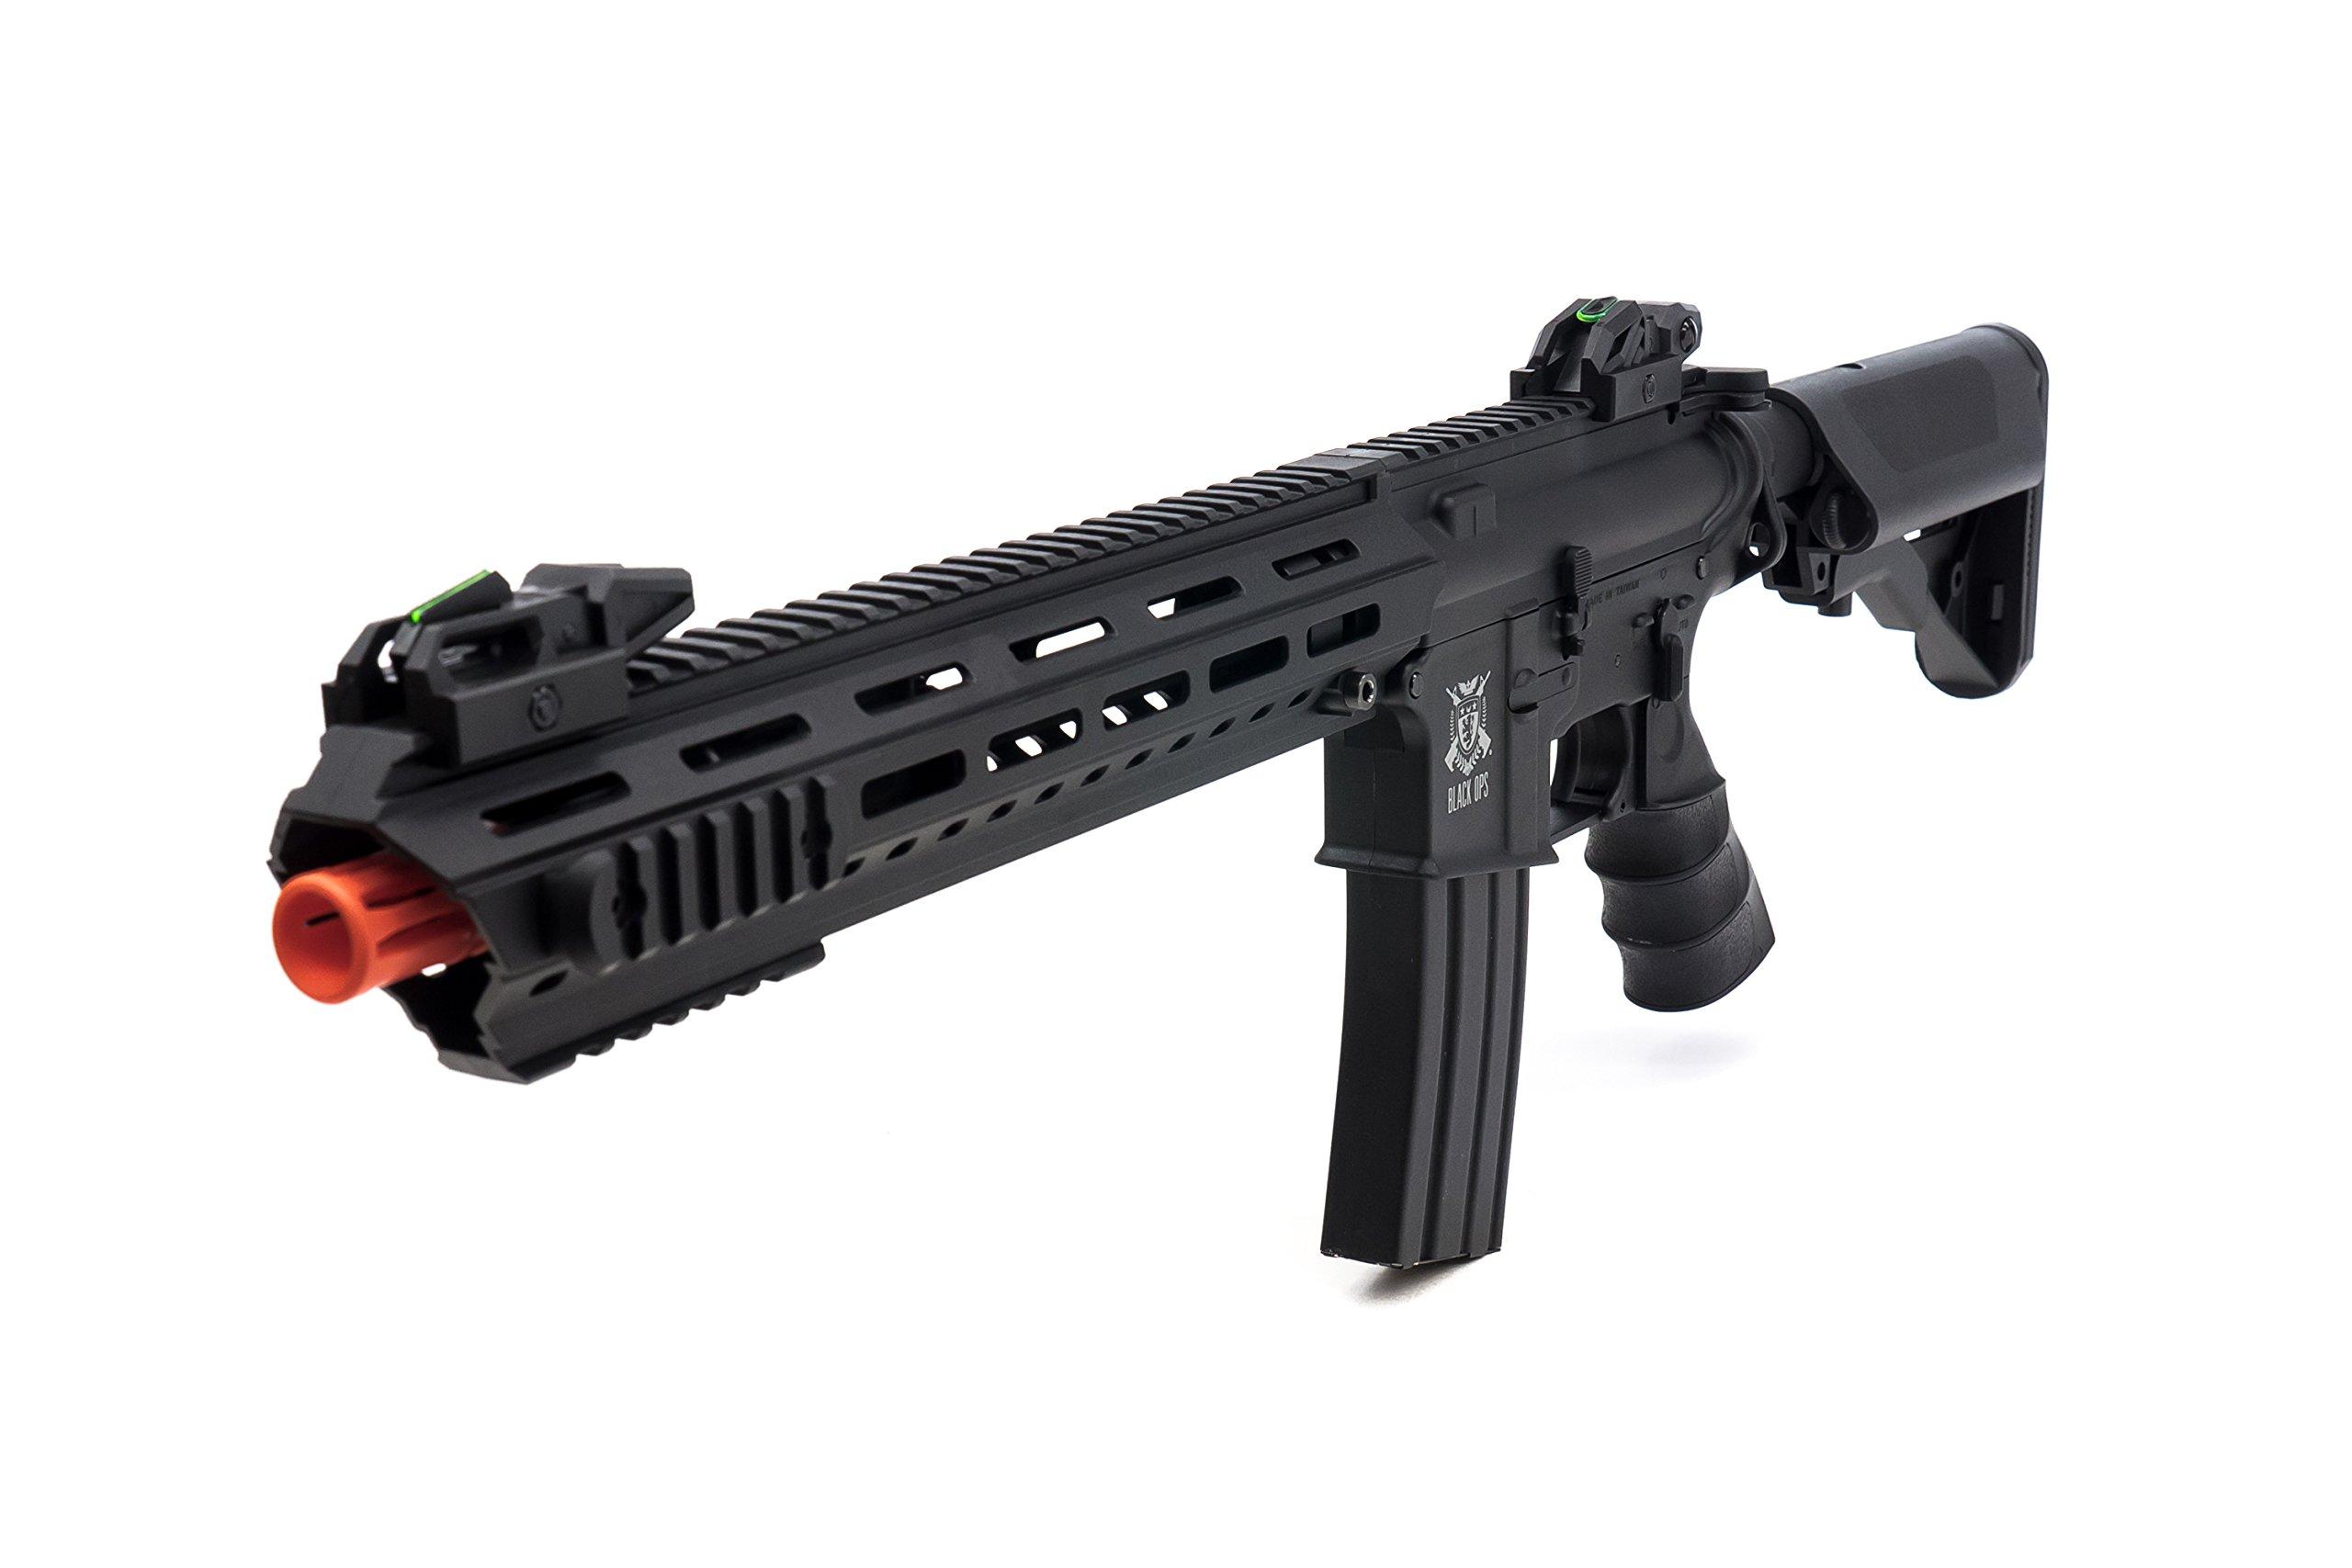 Black Ops M4 Viper Mk5 Airsoft AEG Rifle .20 .25 BB Ammo by Black Ops